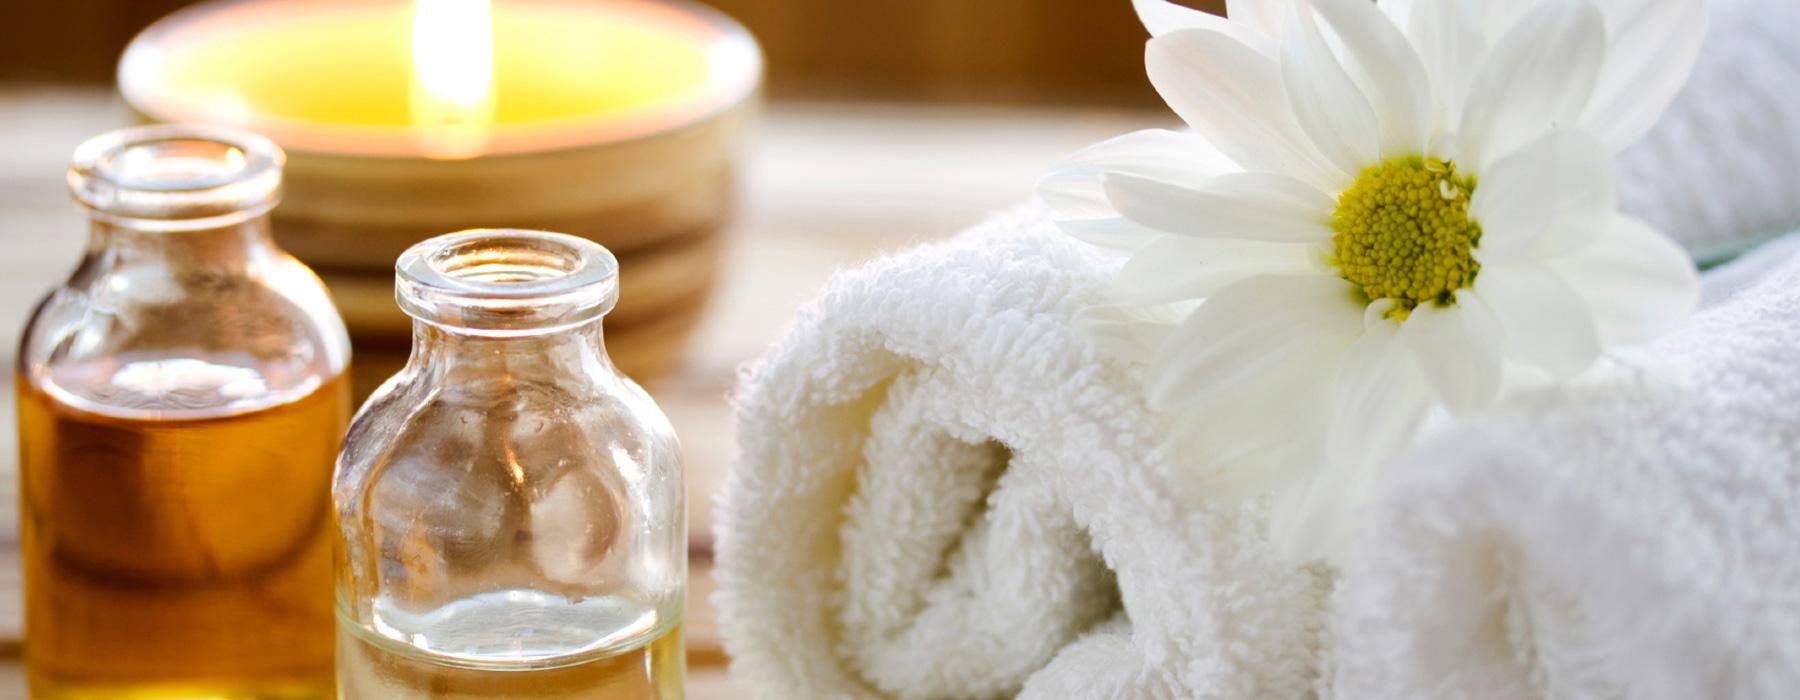 Massage Treatments at Lir Beauty Rooms